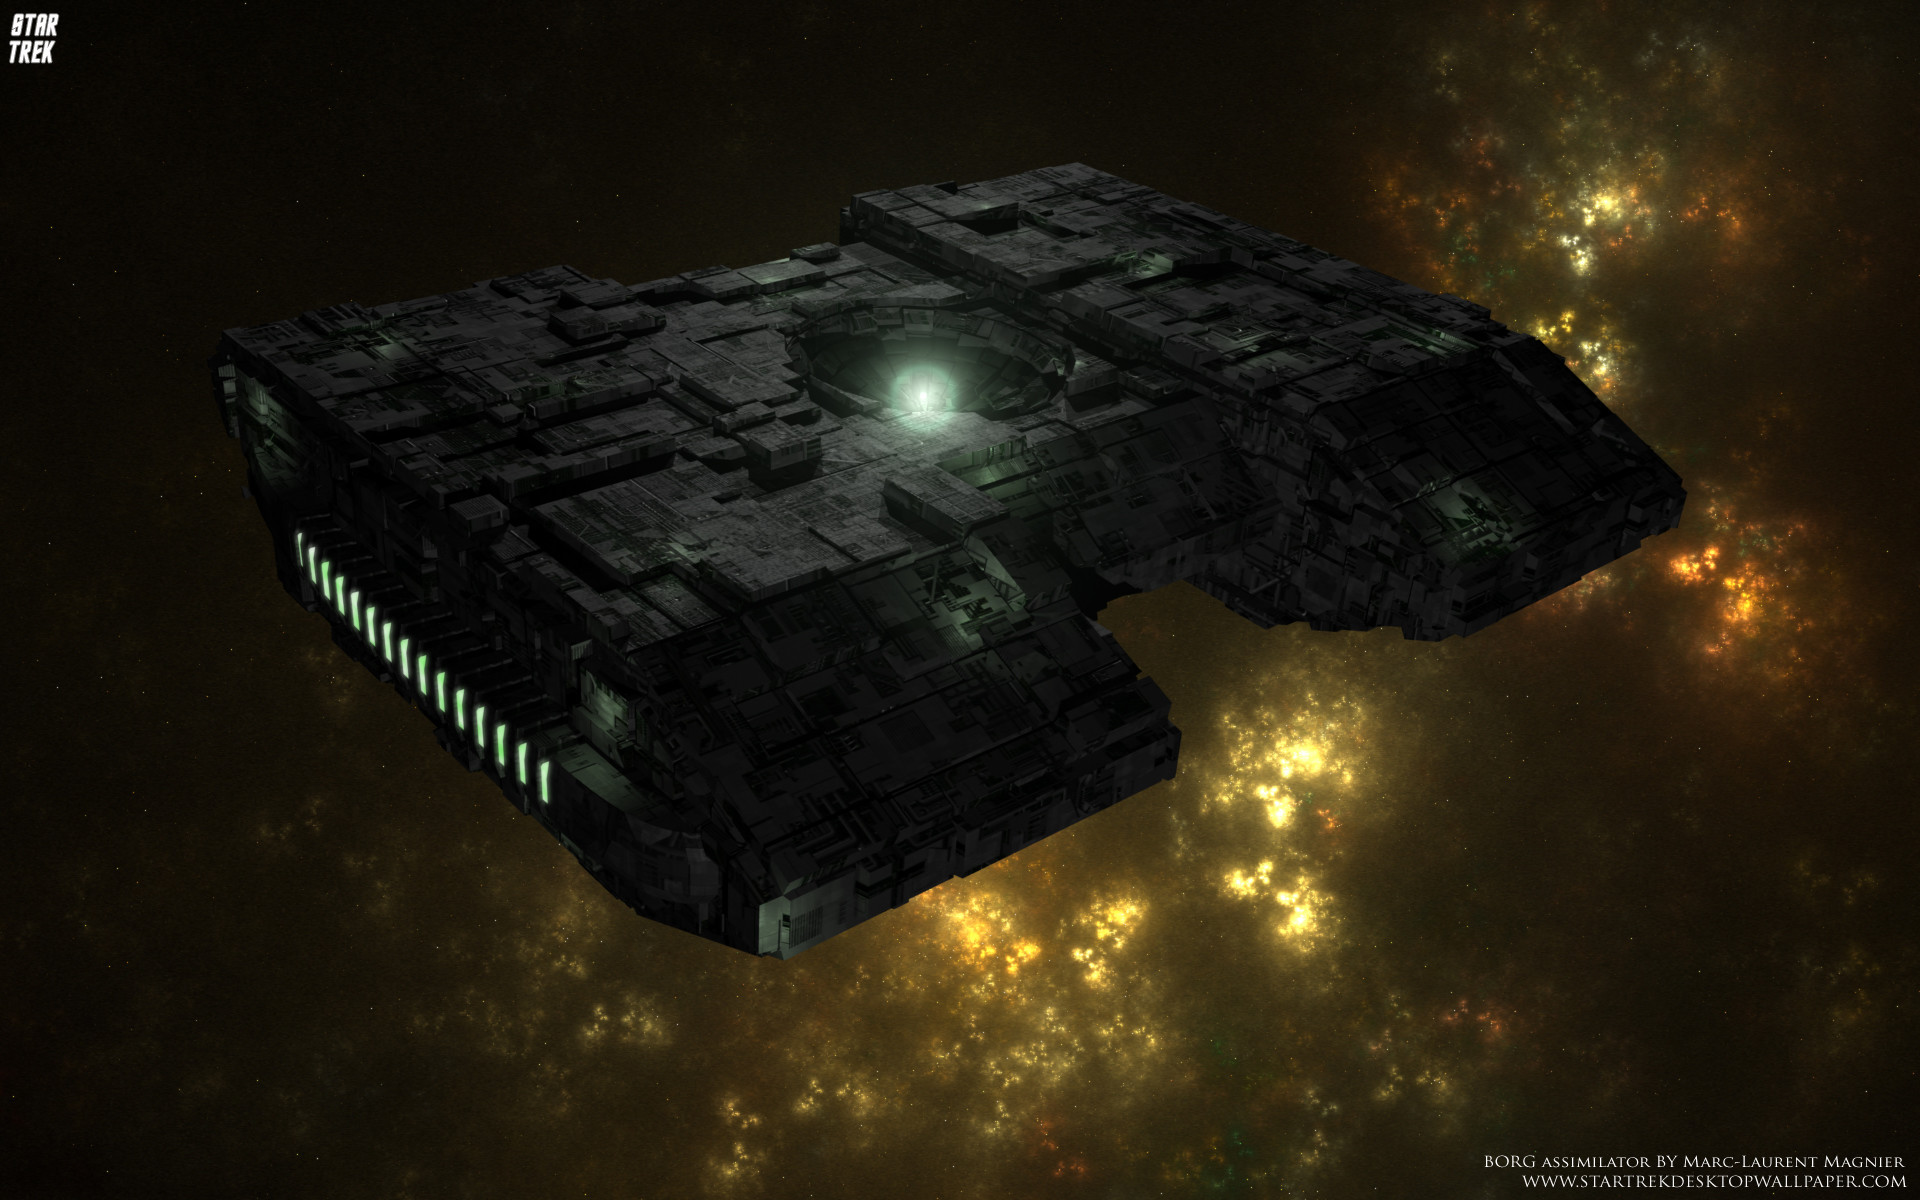 Star Trek Borg Assimilator. Free Star Trek computer desktop wallpaper,  images, pictures download